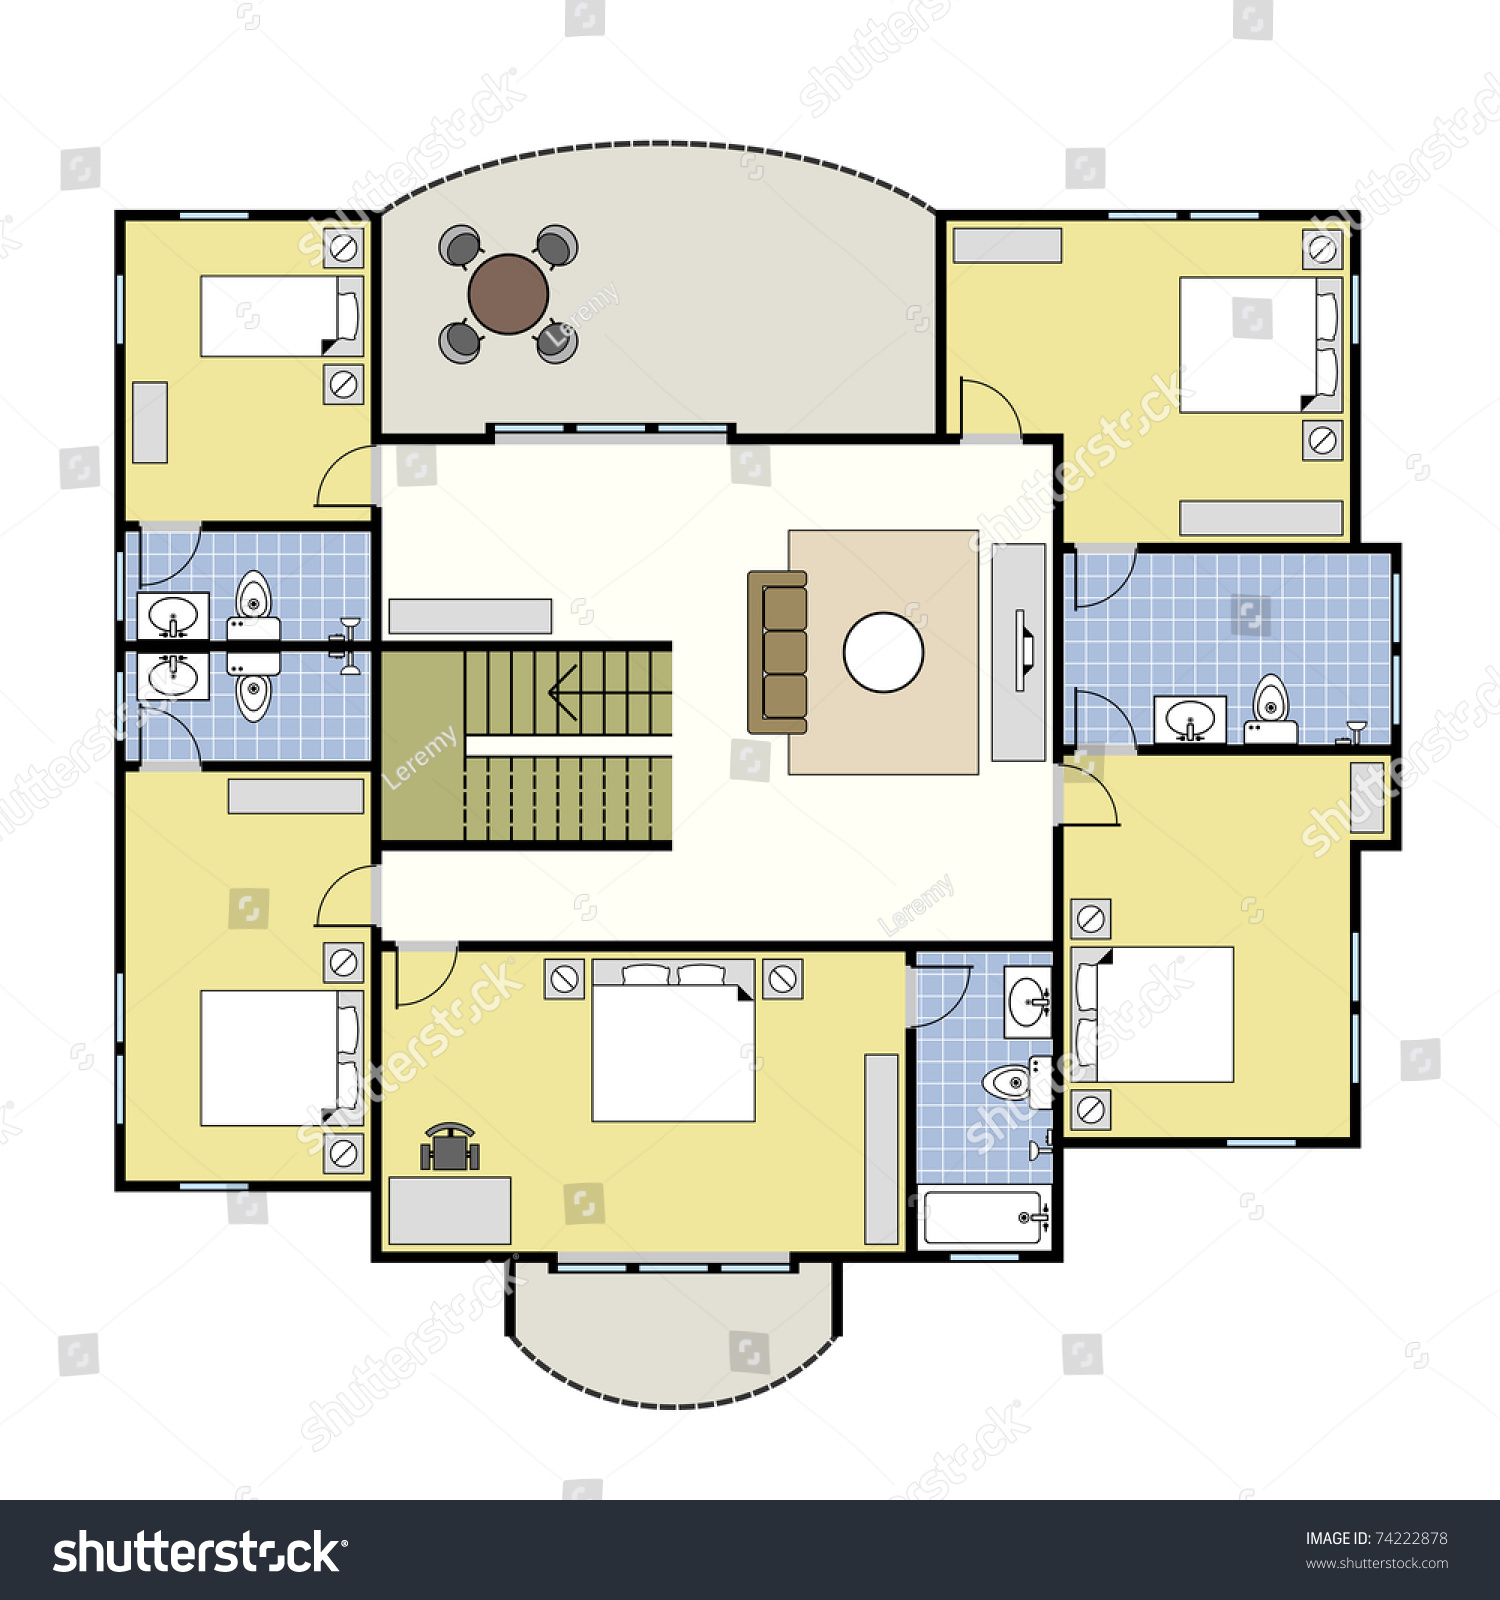 floor plan floorplan house home building architecture blueprint layout fotos floor plan layout house plan